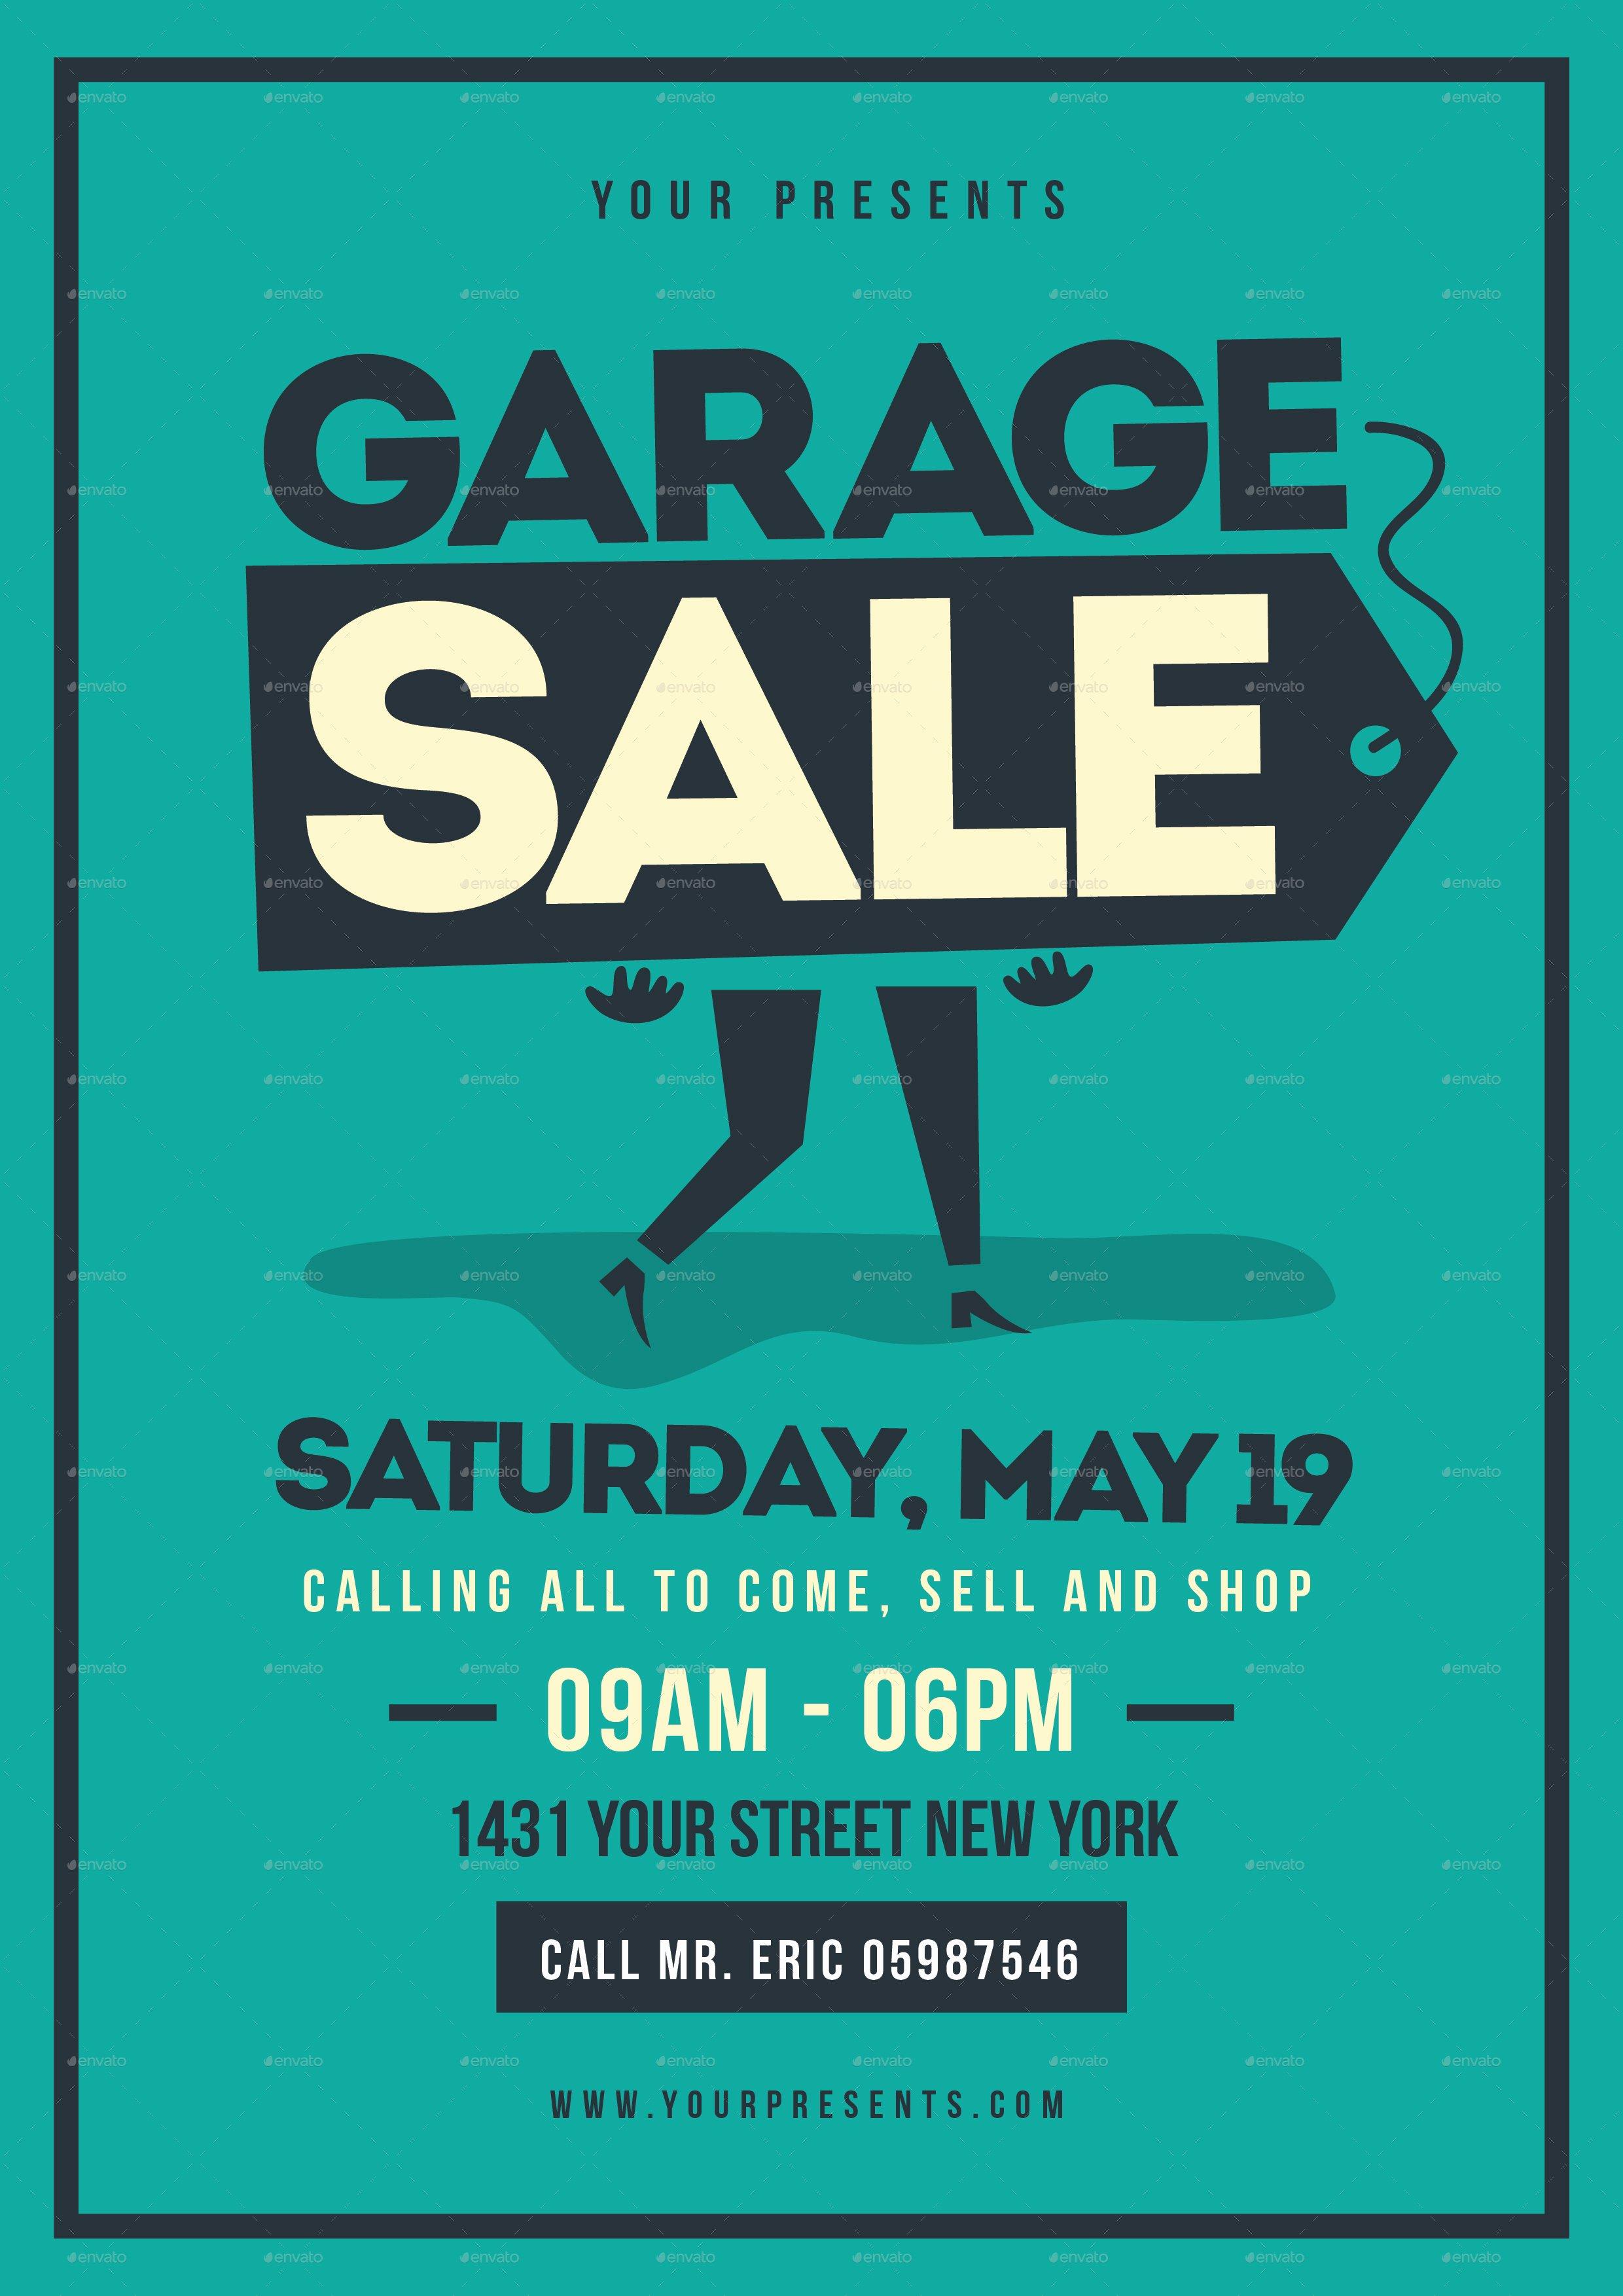 Retro Garage Sale Flyer by Lilynthesweetpea